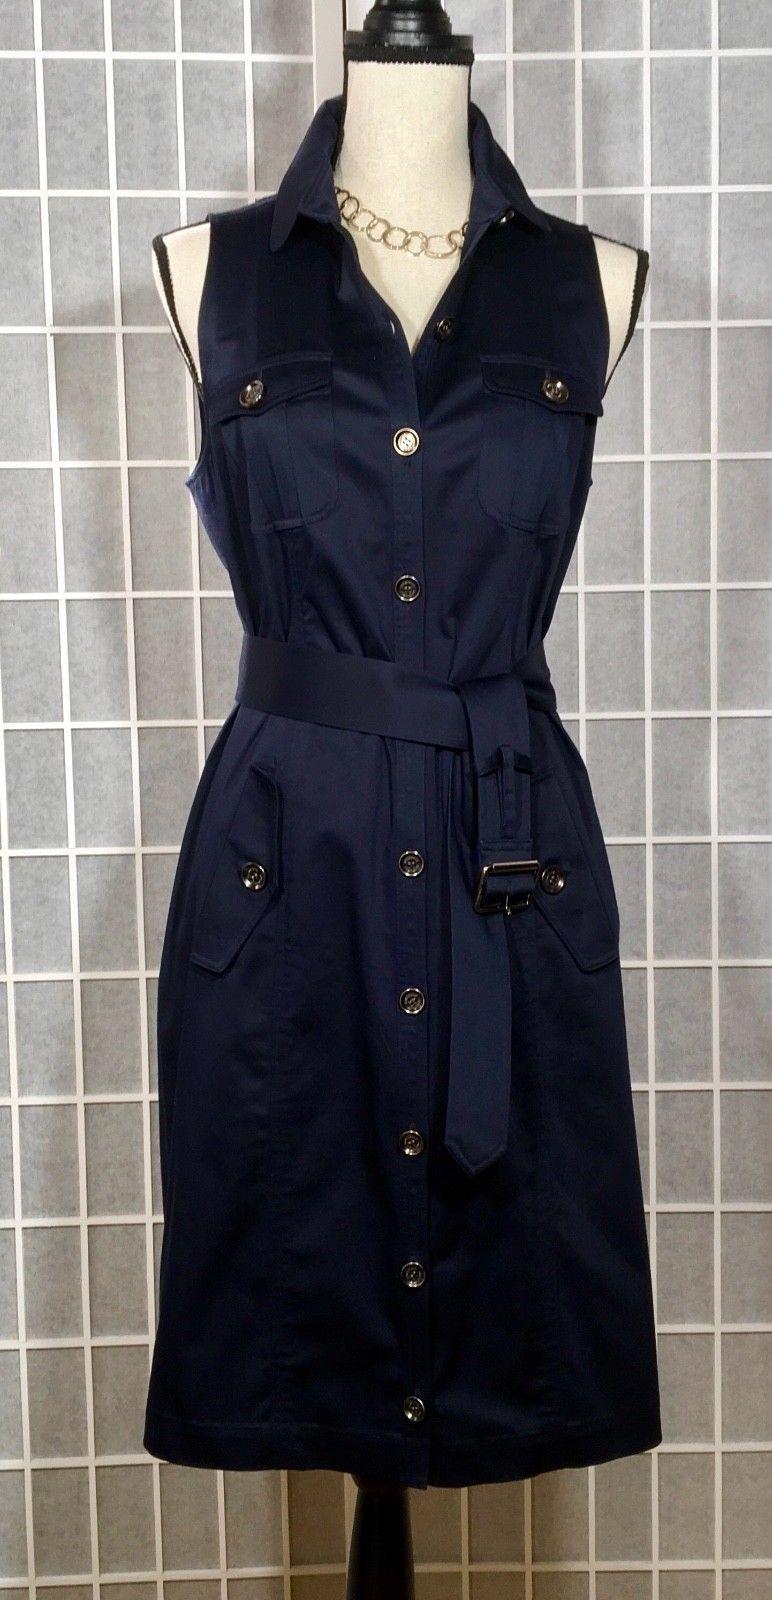 burberry dress womens london